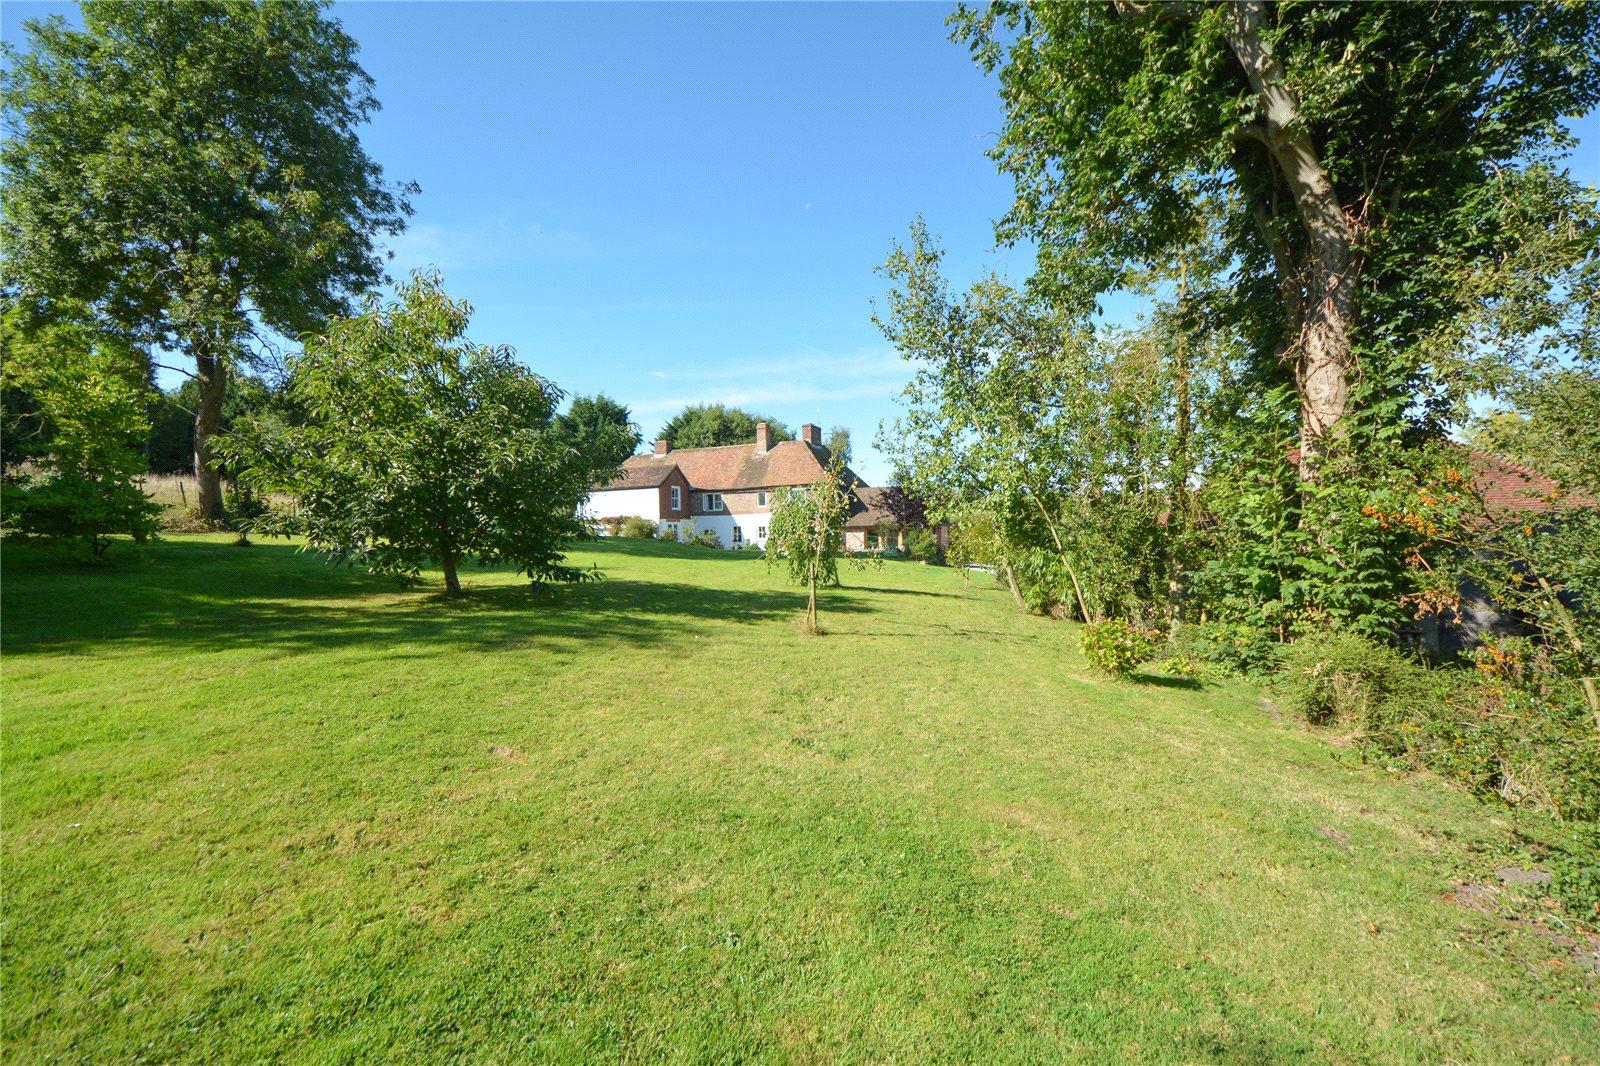 Villa per Vendita alle ore Church Lane, Aldington, Ashford, Kent, TN25 Ashford, Inghilterra